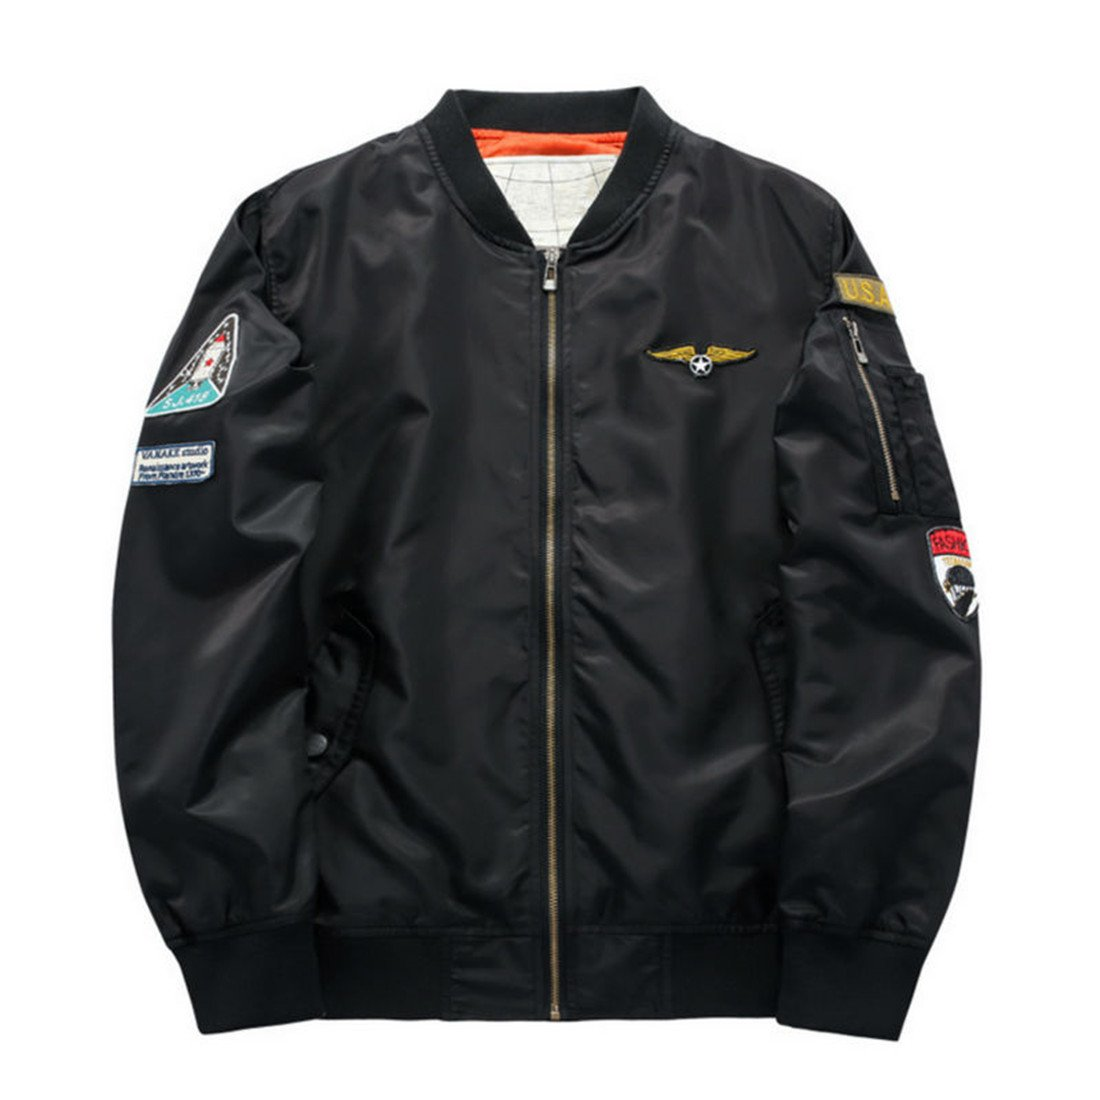 Hzcx Fashion men's classic usa flag badge light weight flight bomber jackets 2016111-MA01-58-B-US XL(48) TAG 5XL